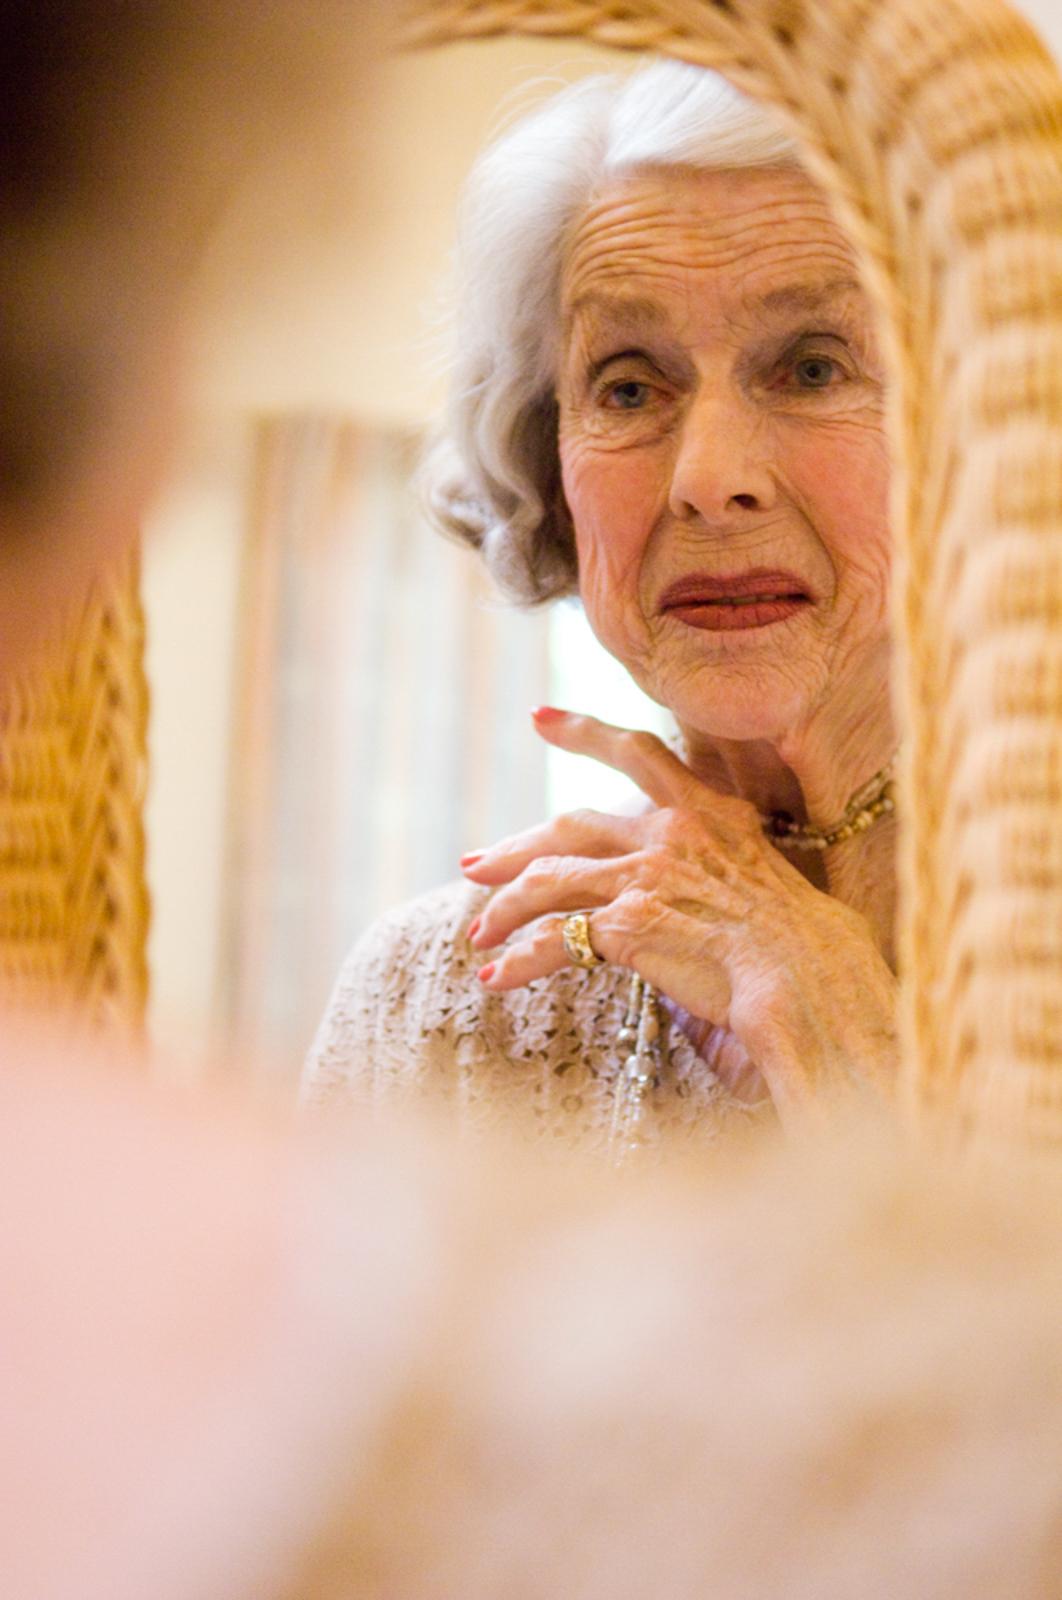 Portrait of elegant elderly woman staring at the mirror